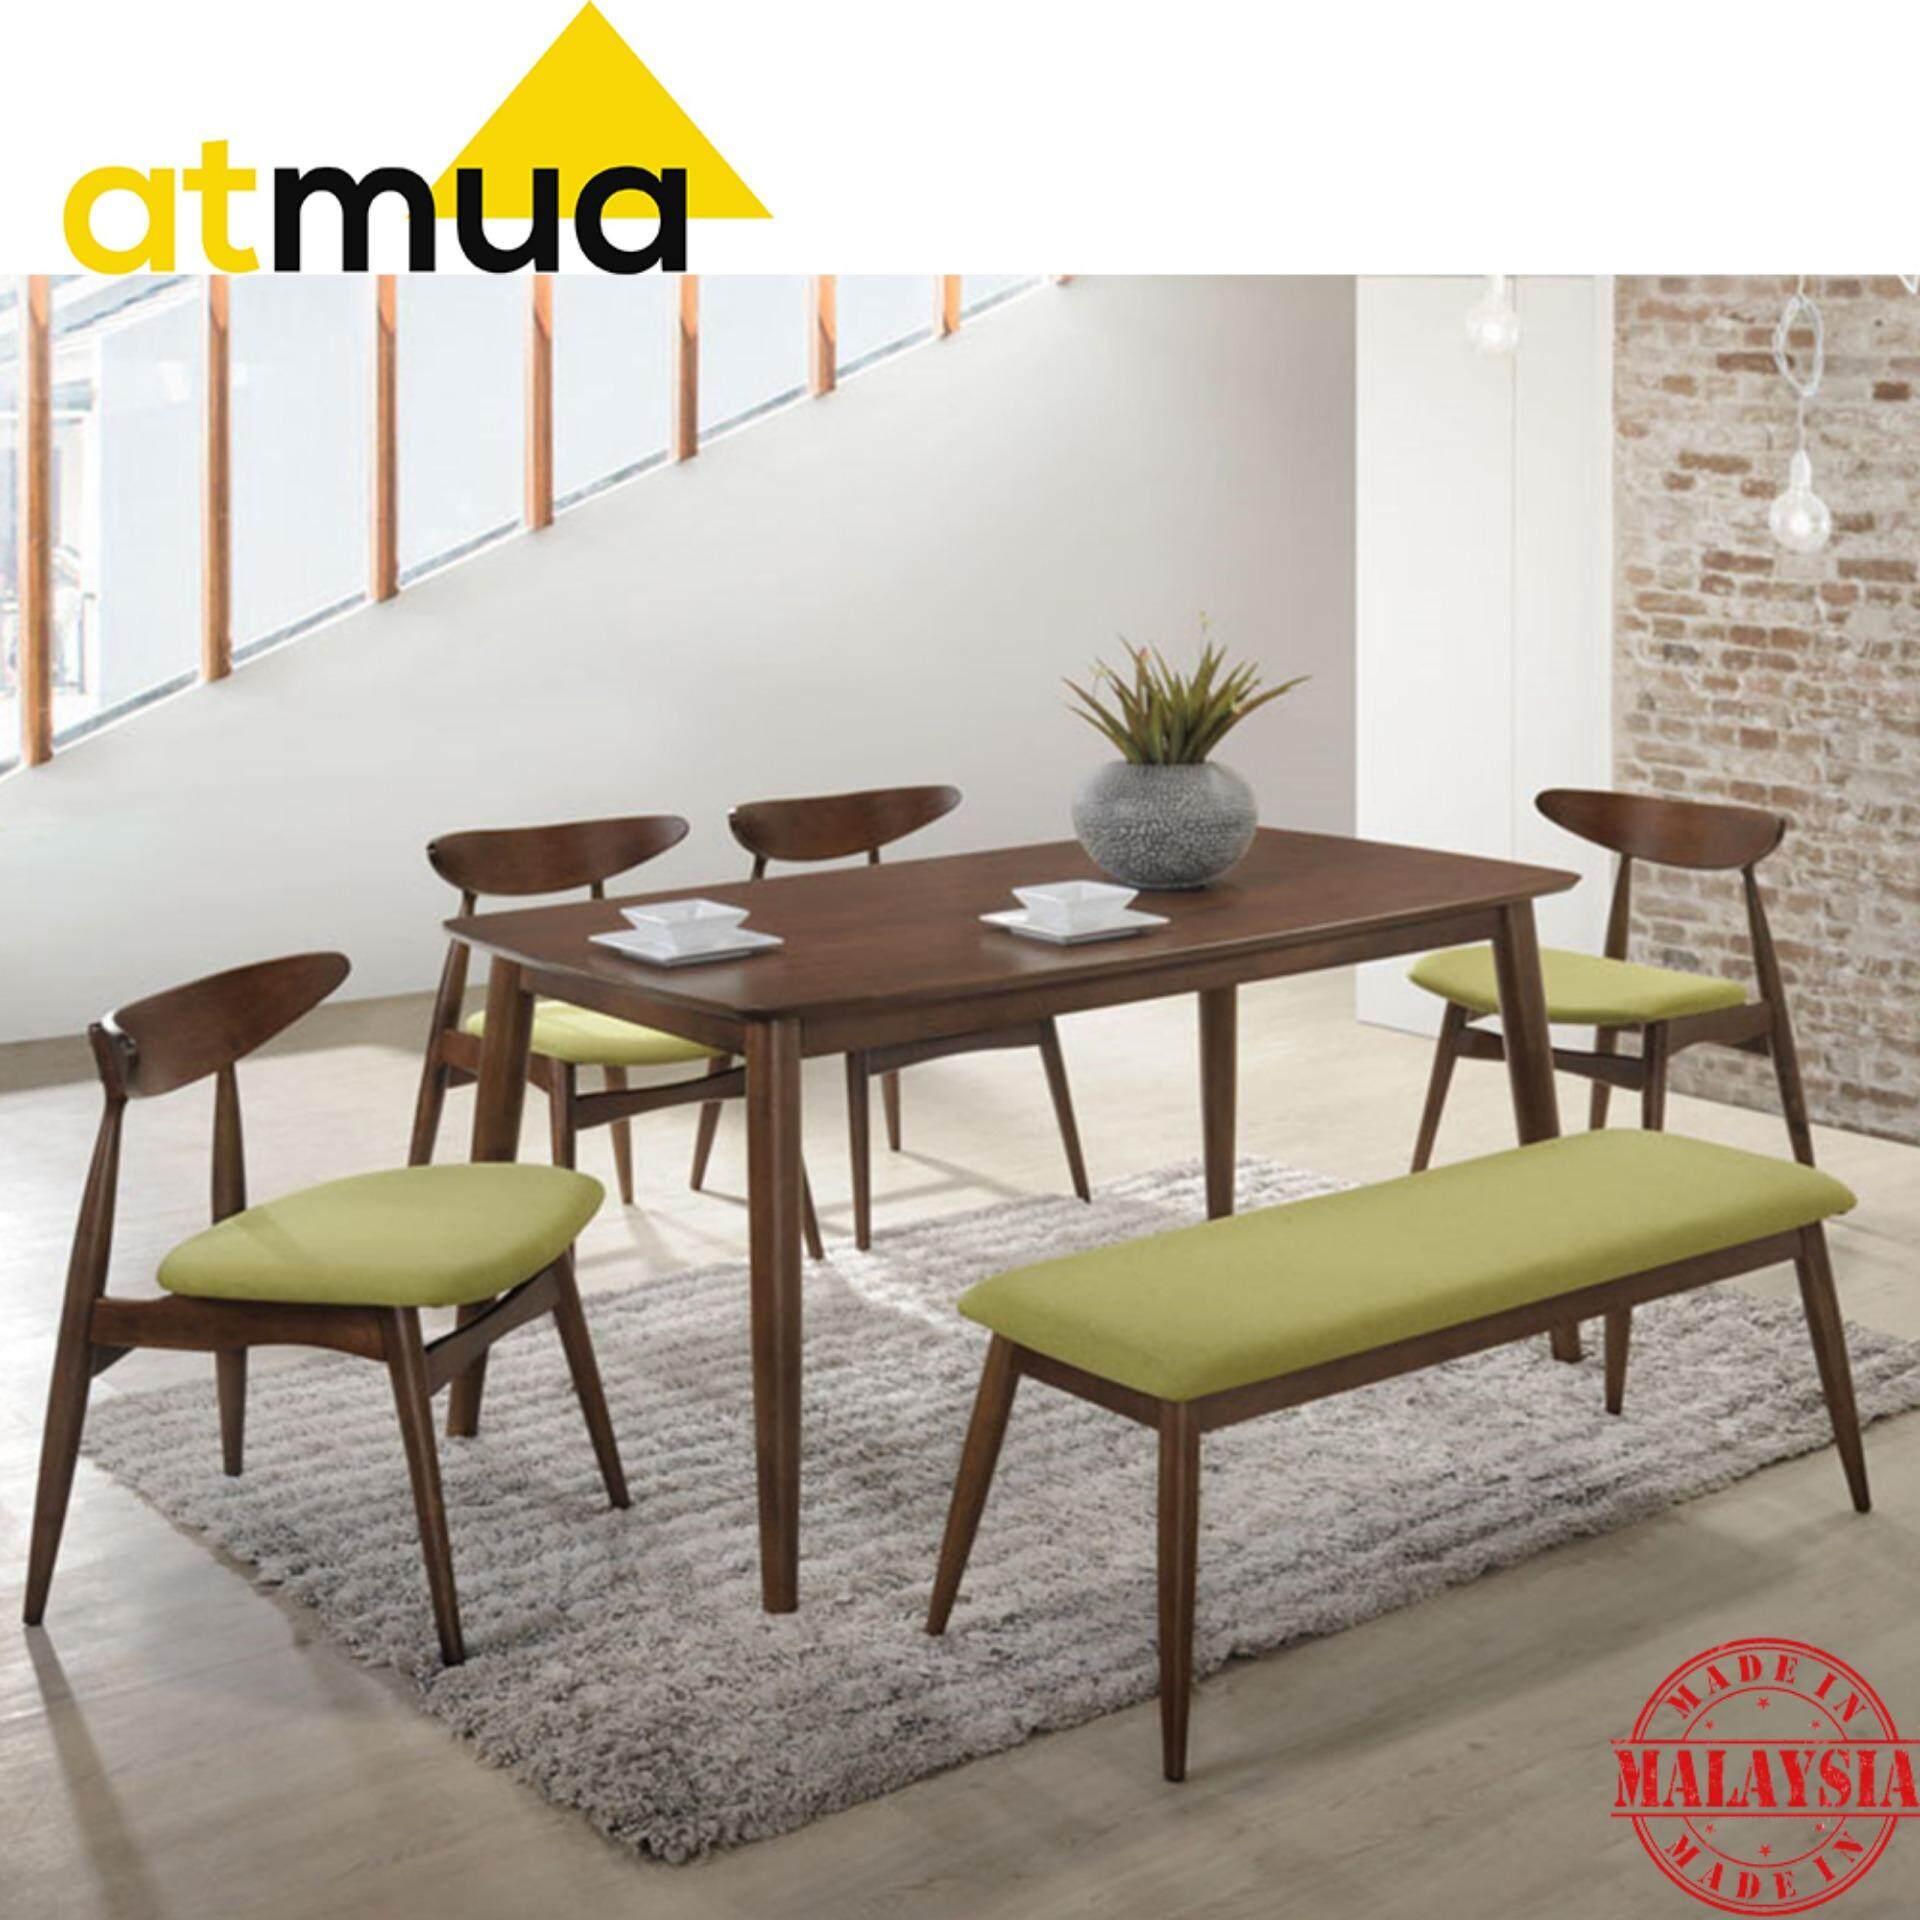 Atmua Borato Dining Set 1 Table 4